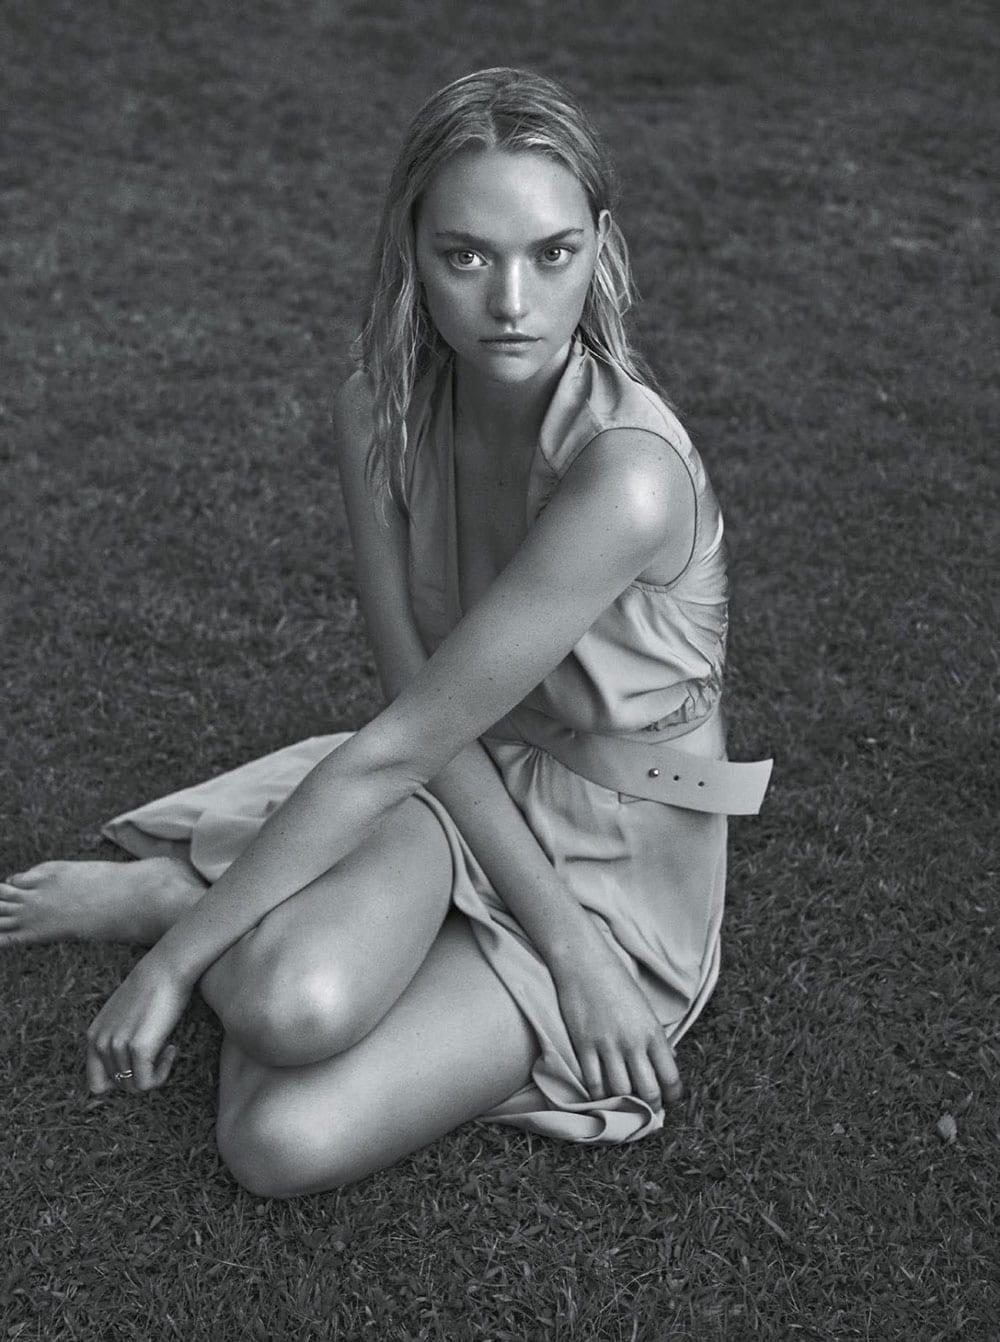 Style&Minimalism | Editorials | January 2016 | Vogue Australia | Gemma Ward by Lachlan Bailey